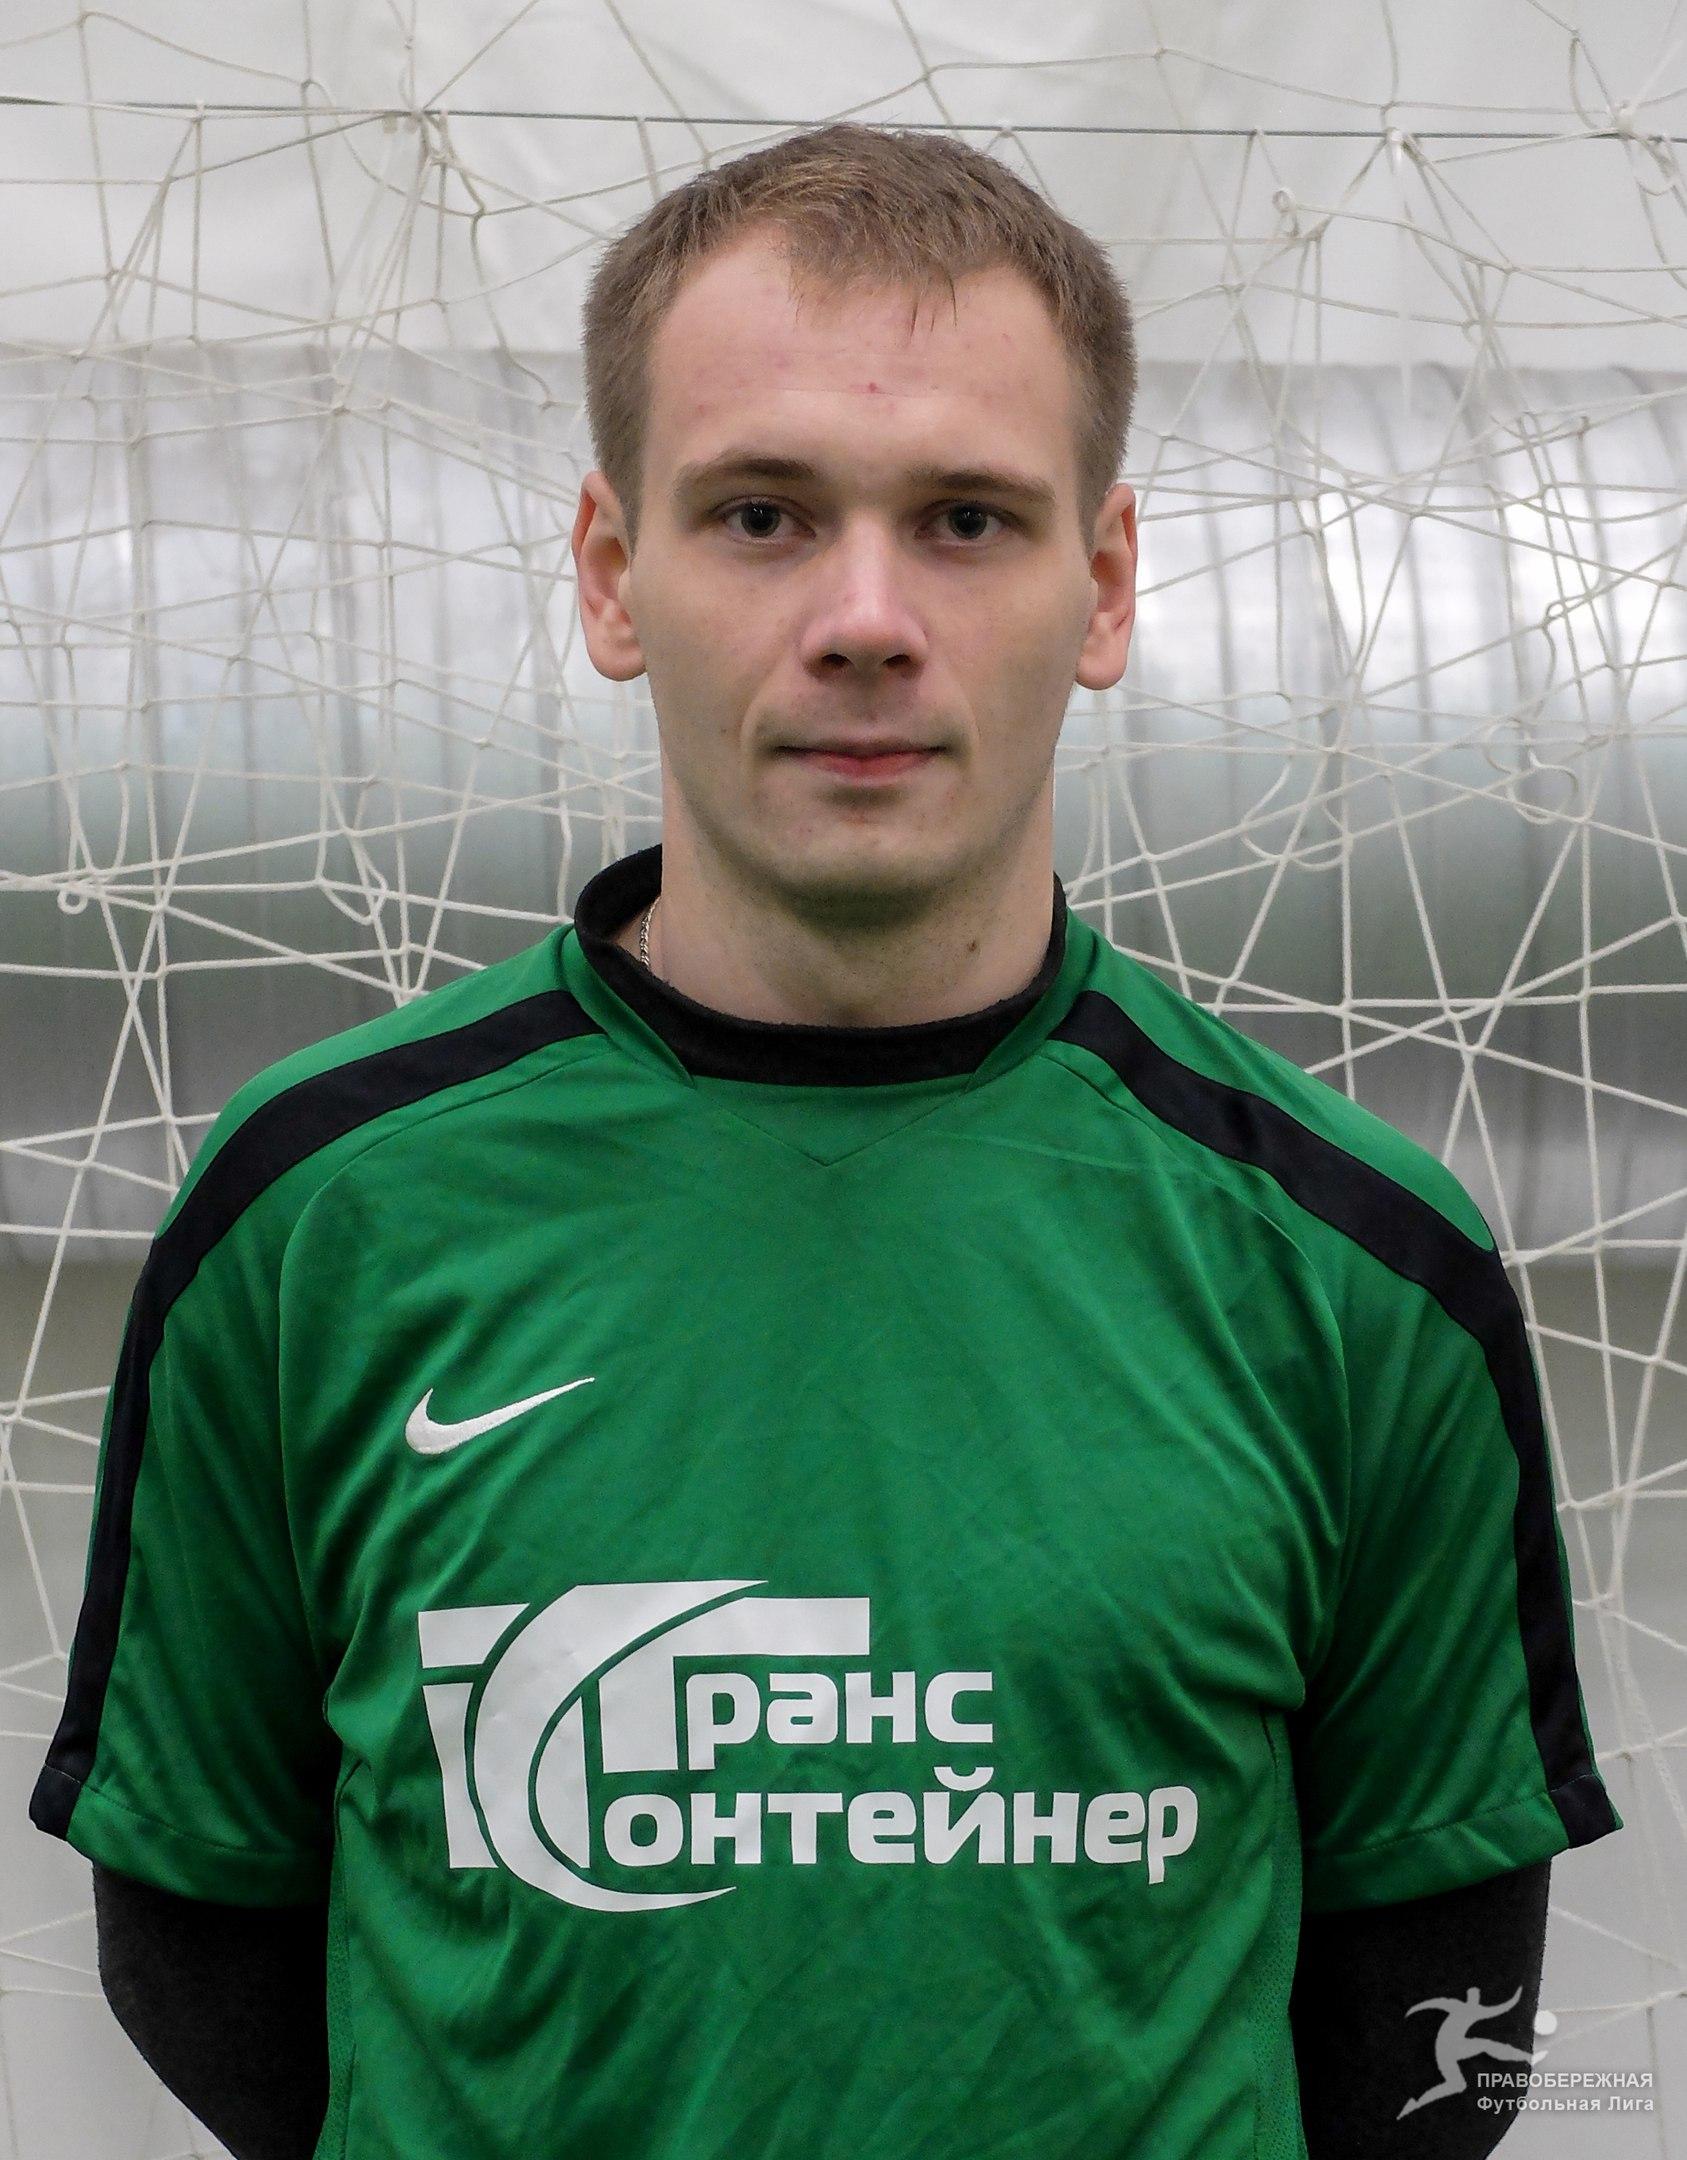 Баранов Кирилл